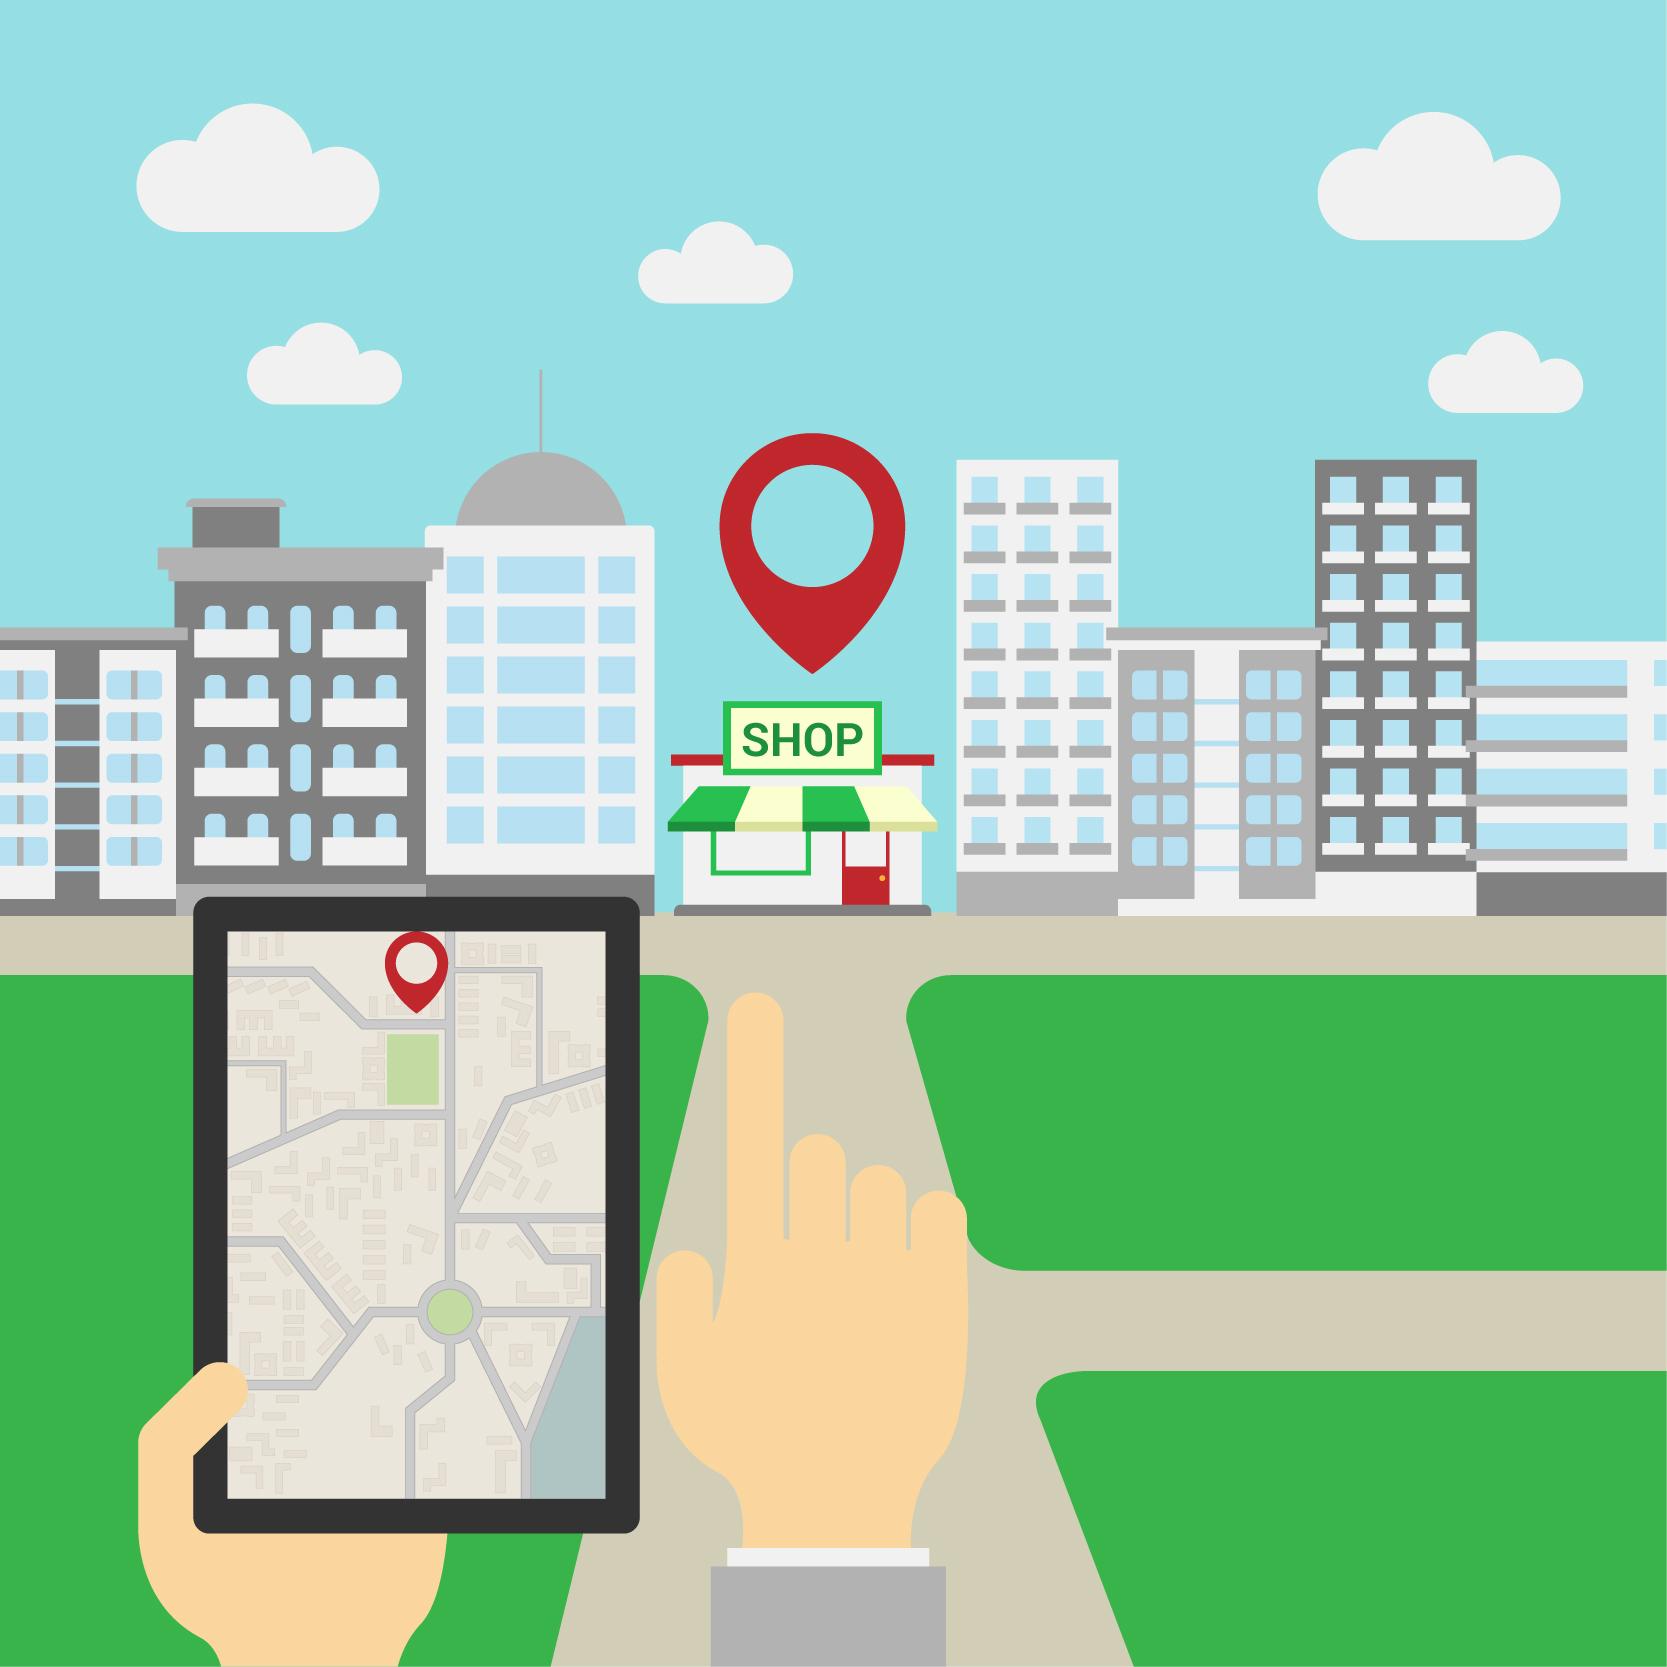 Mapa Interactivo Image